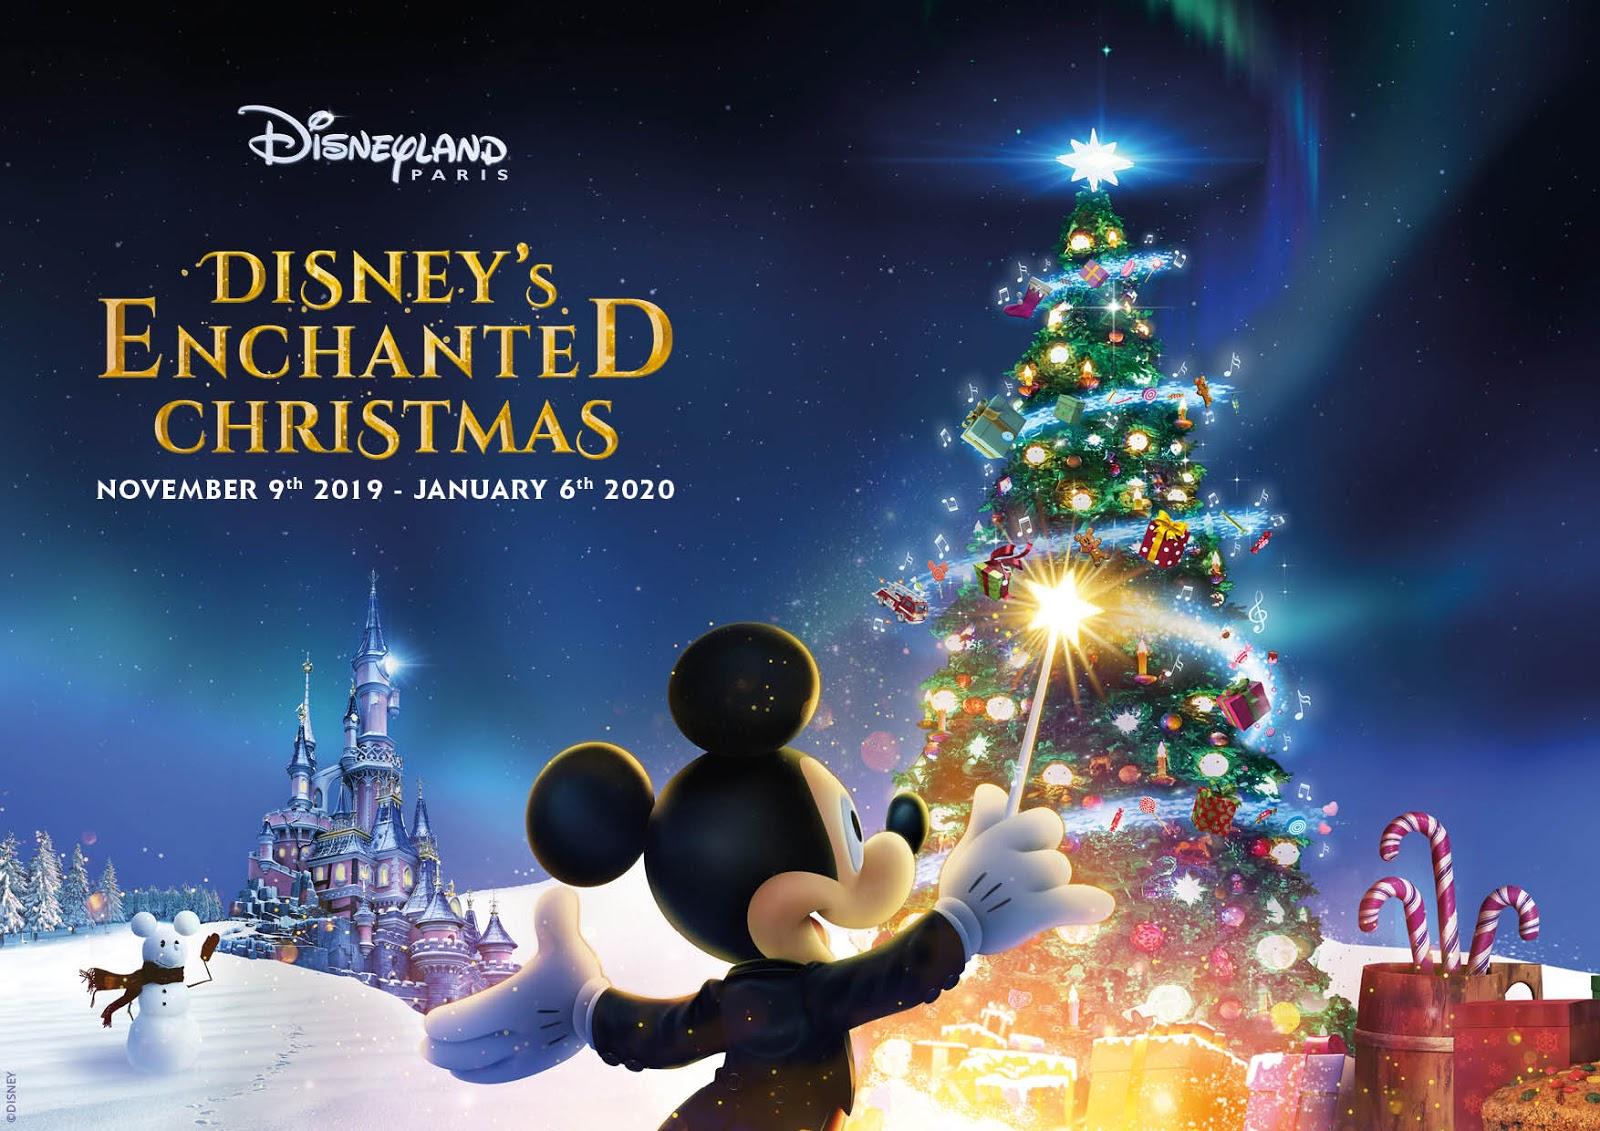 Christmas 2020.Disneyland Paris Announces Dates For Disney S Enchanted